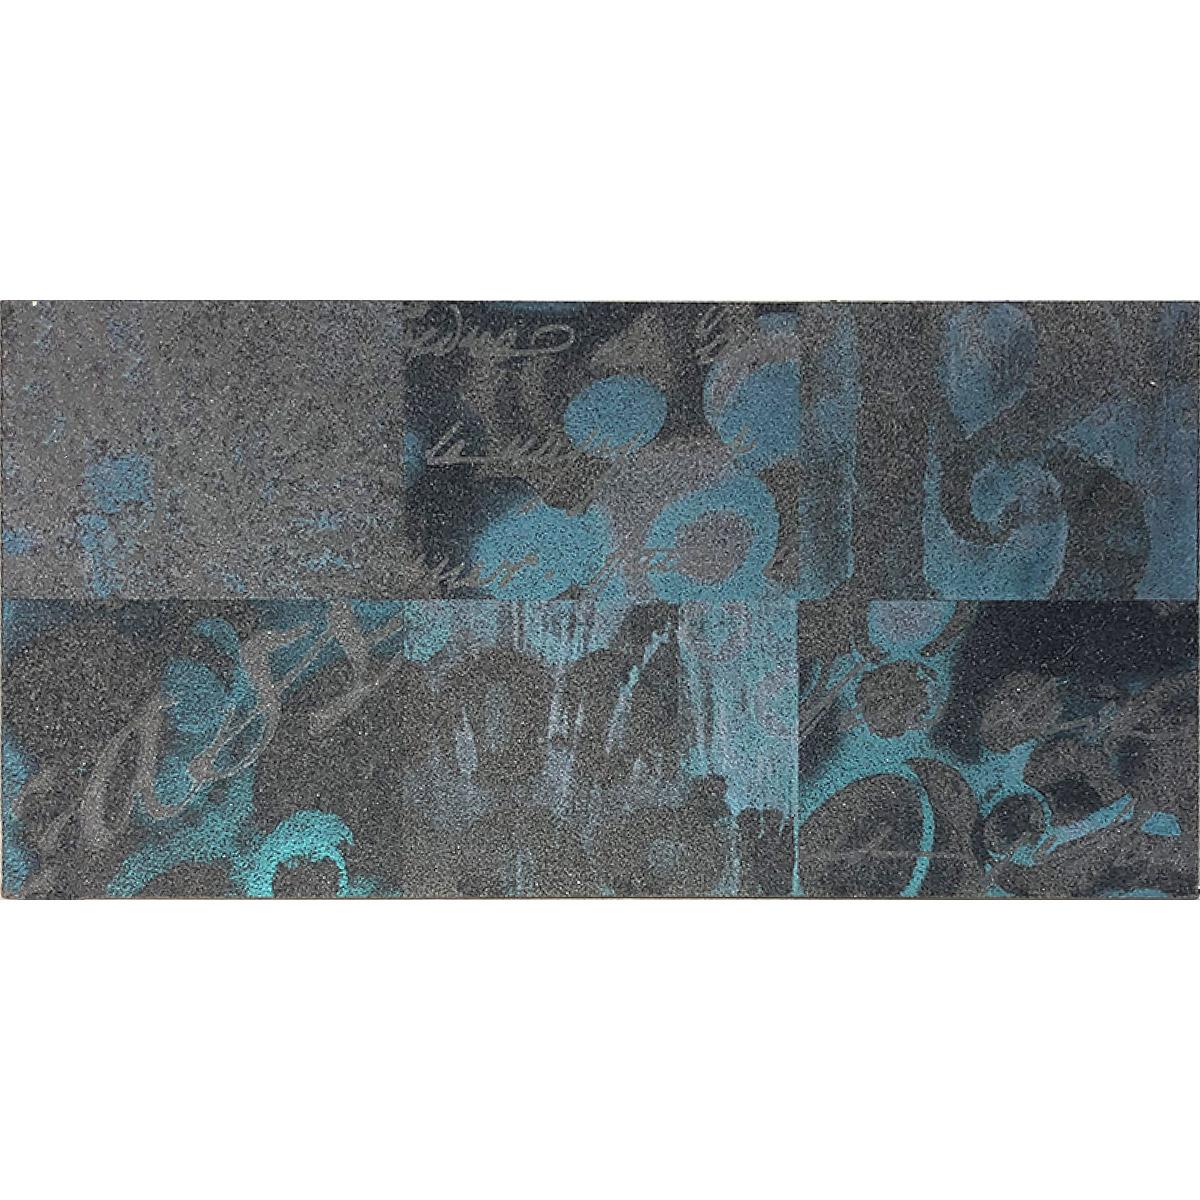 D00060 FLASH GRAFFITTI INSERT SILVER